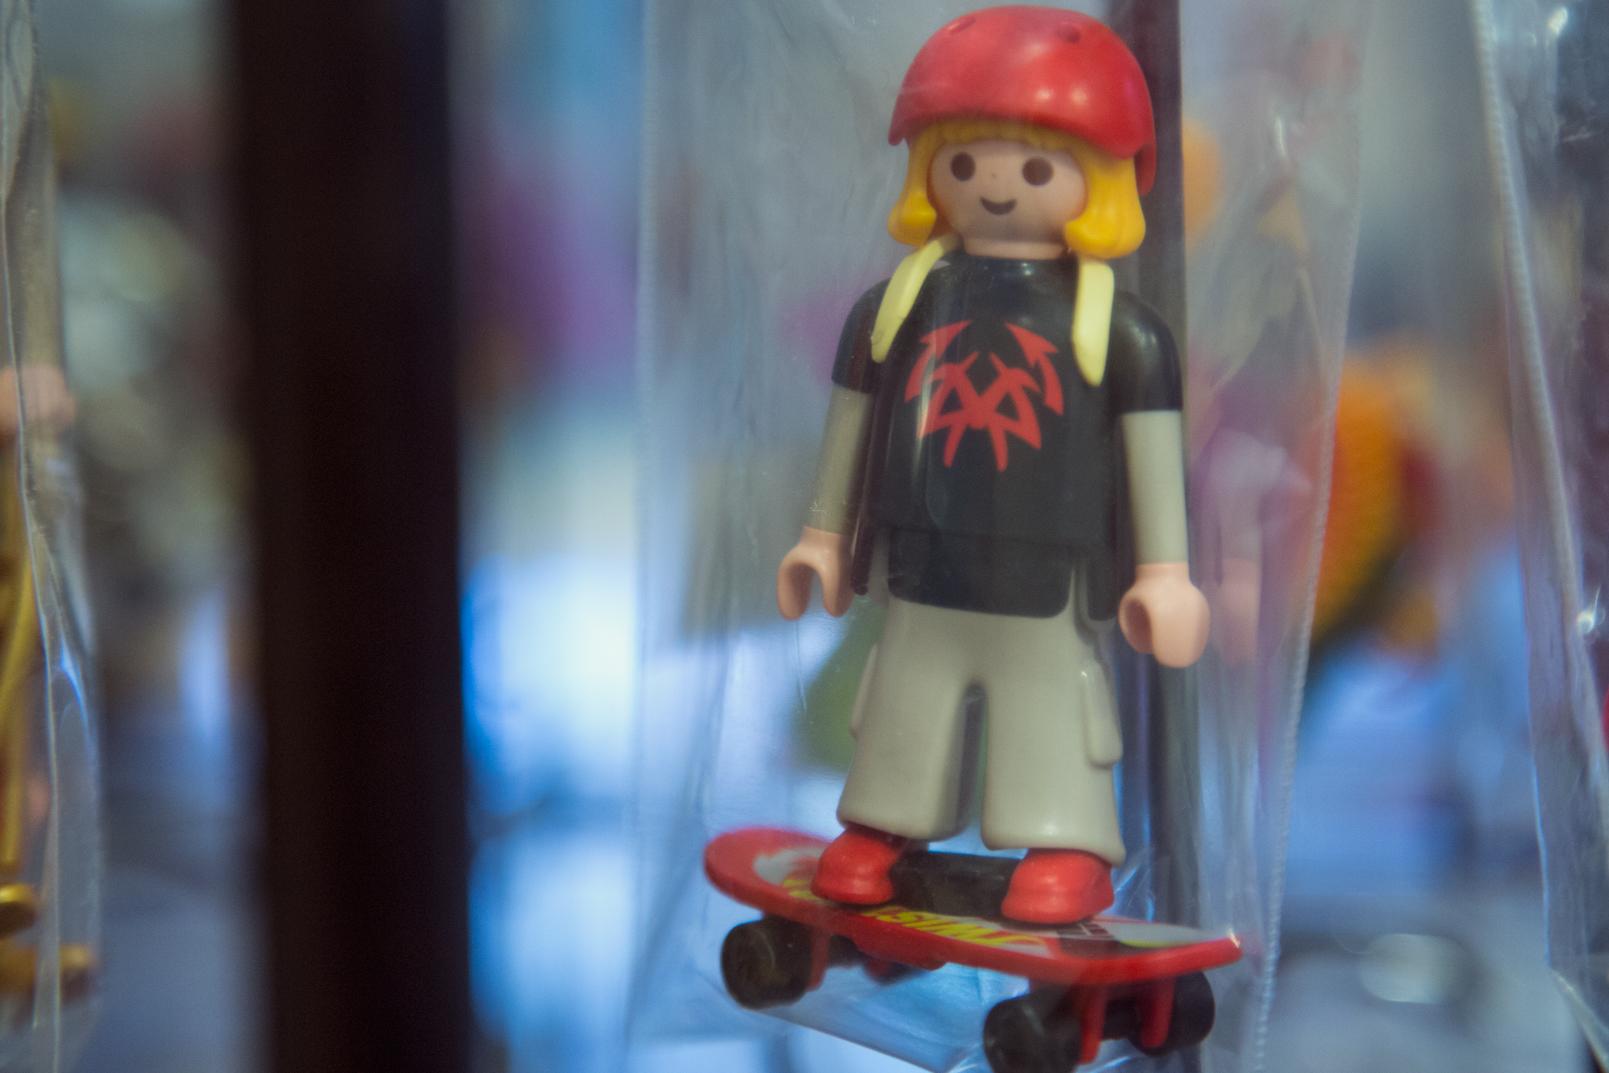 Playmobil από όλες τις δεκαετίες, από αρχές 80s με Lyra μέχρι 2016 με Zeus και Athena της Geobra